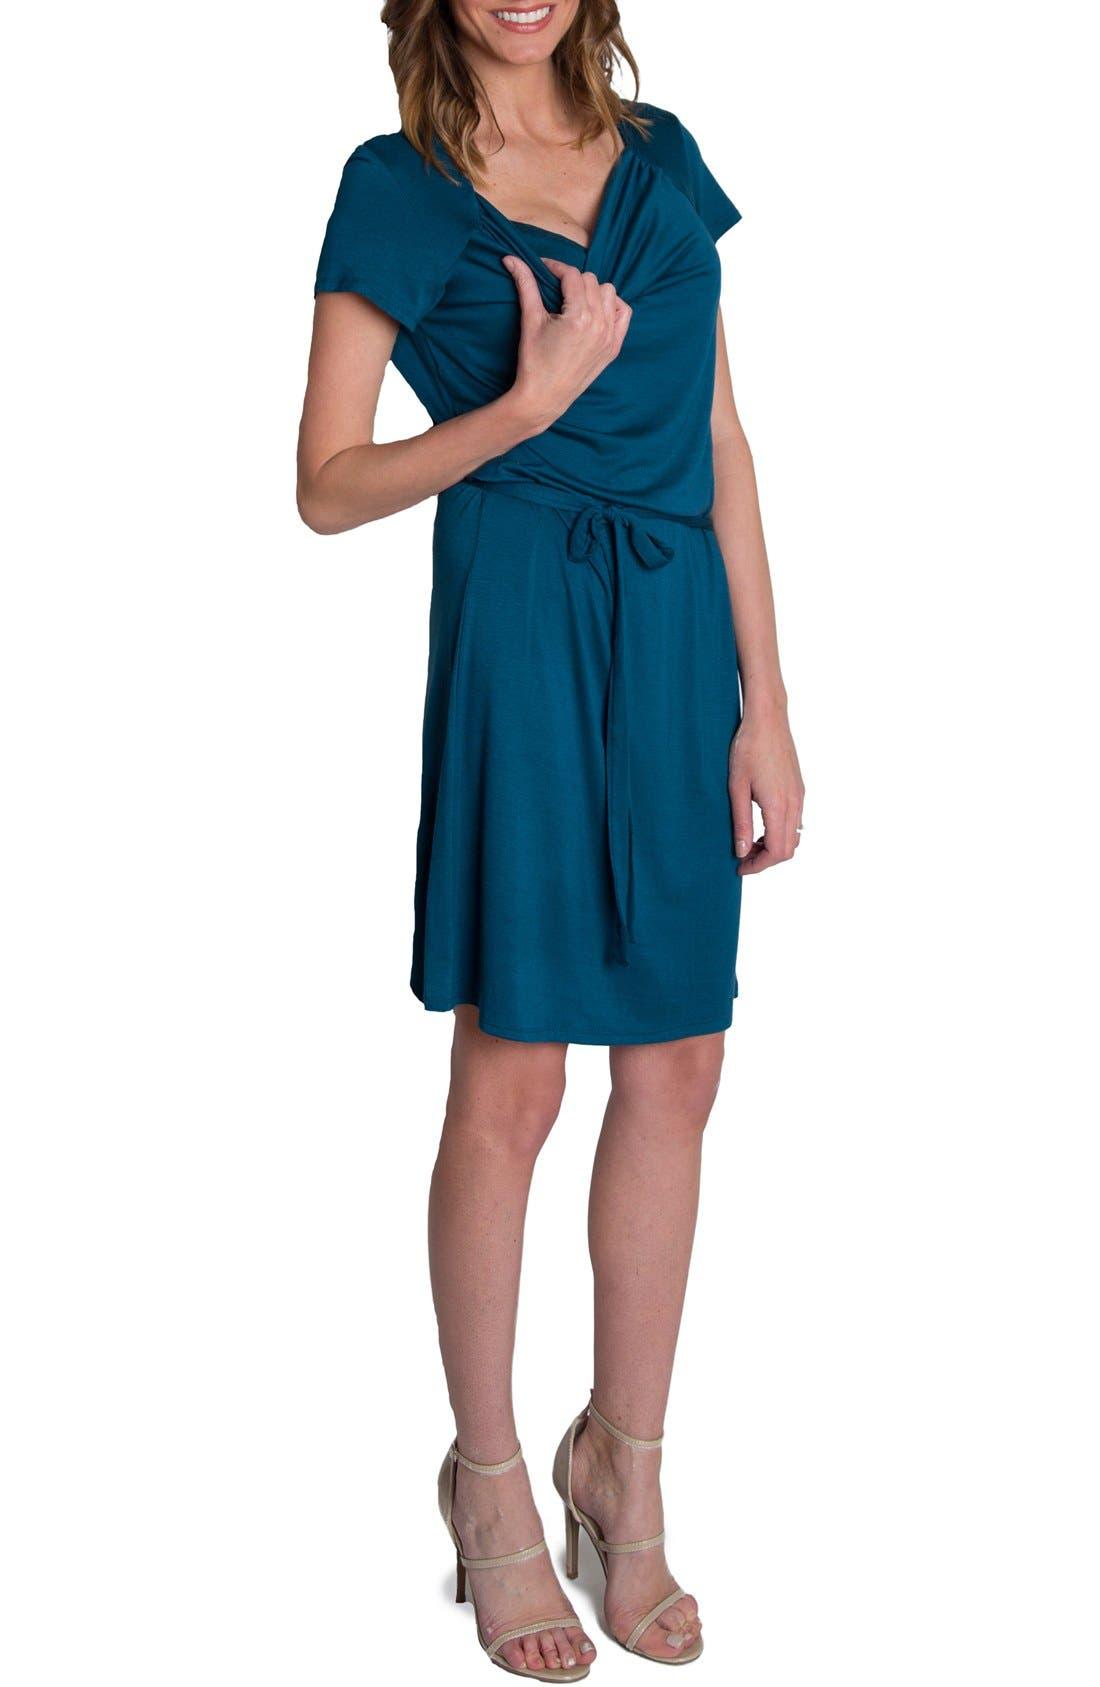 'Chic' Cowl Neck Nursing Dress,                             Alternate thumbnail 4, color,                             Teal